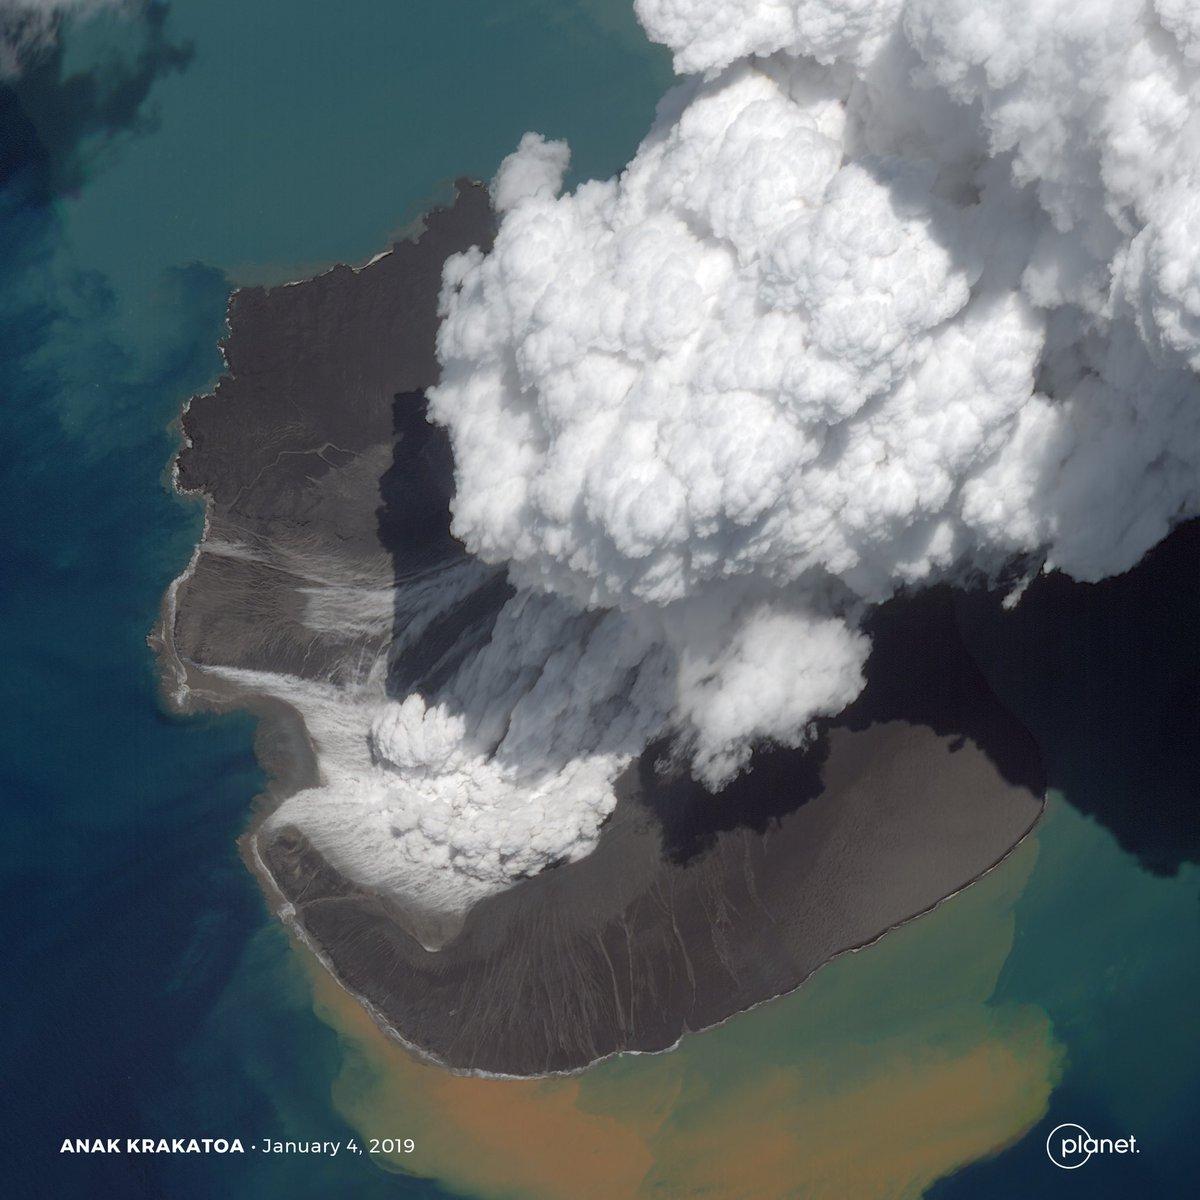 Satellite image of the Anak Krakatoa volcano, Indonesia, January 4, 2019